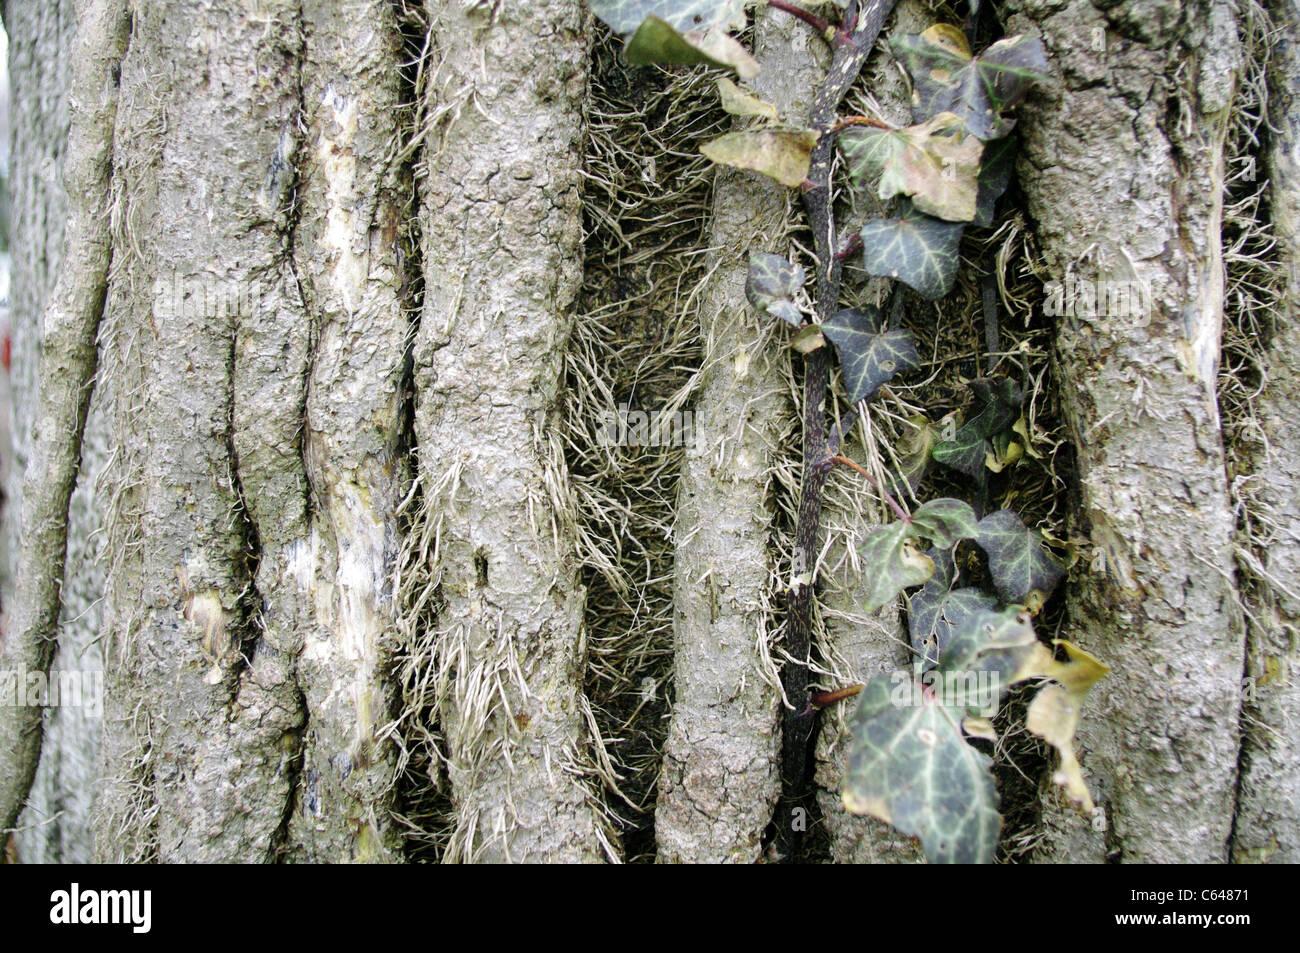 Acero Radici Invasive inglese (edera hedera helix) i vitigni e radici intubamento